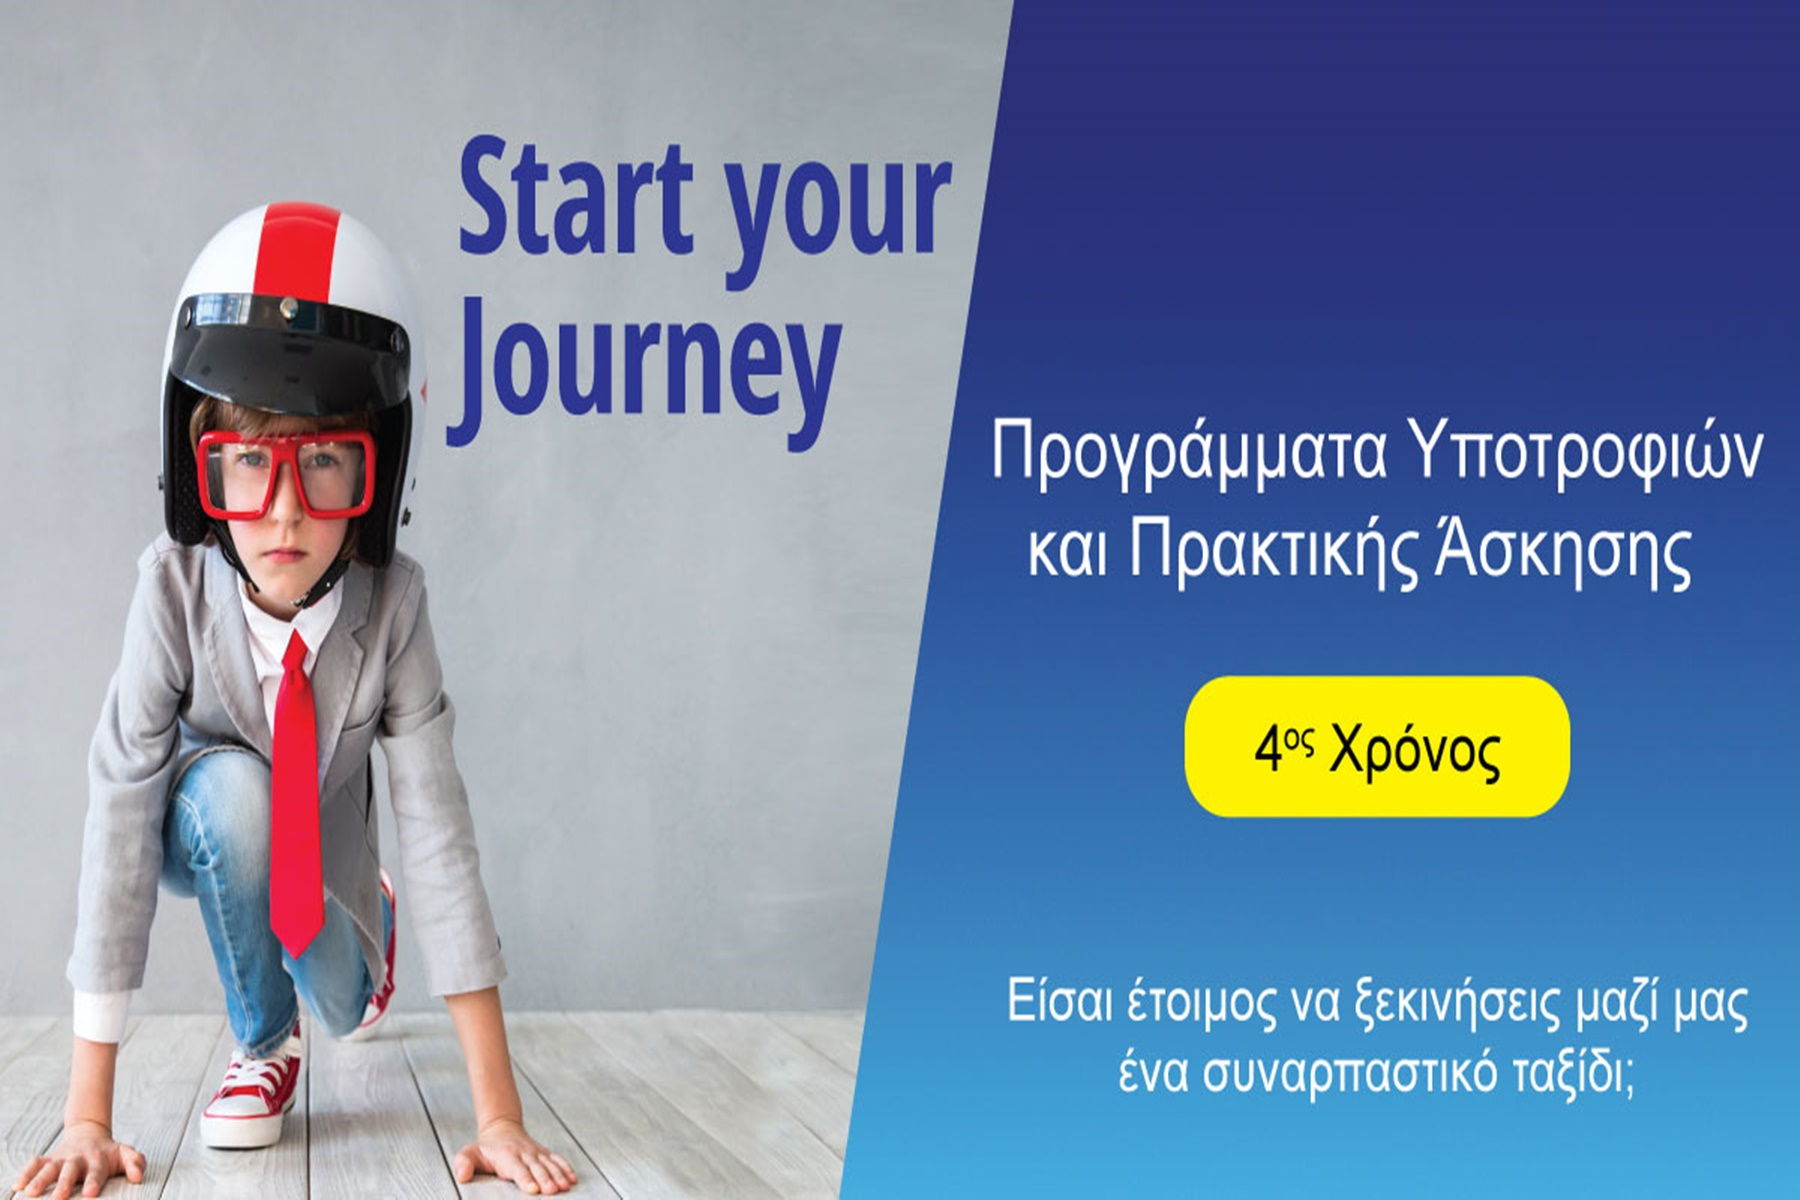 DEMO ABEE : Υλοποιεί ξανά τα προγράμματα start Your Journey